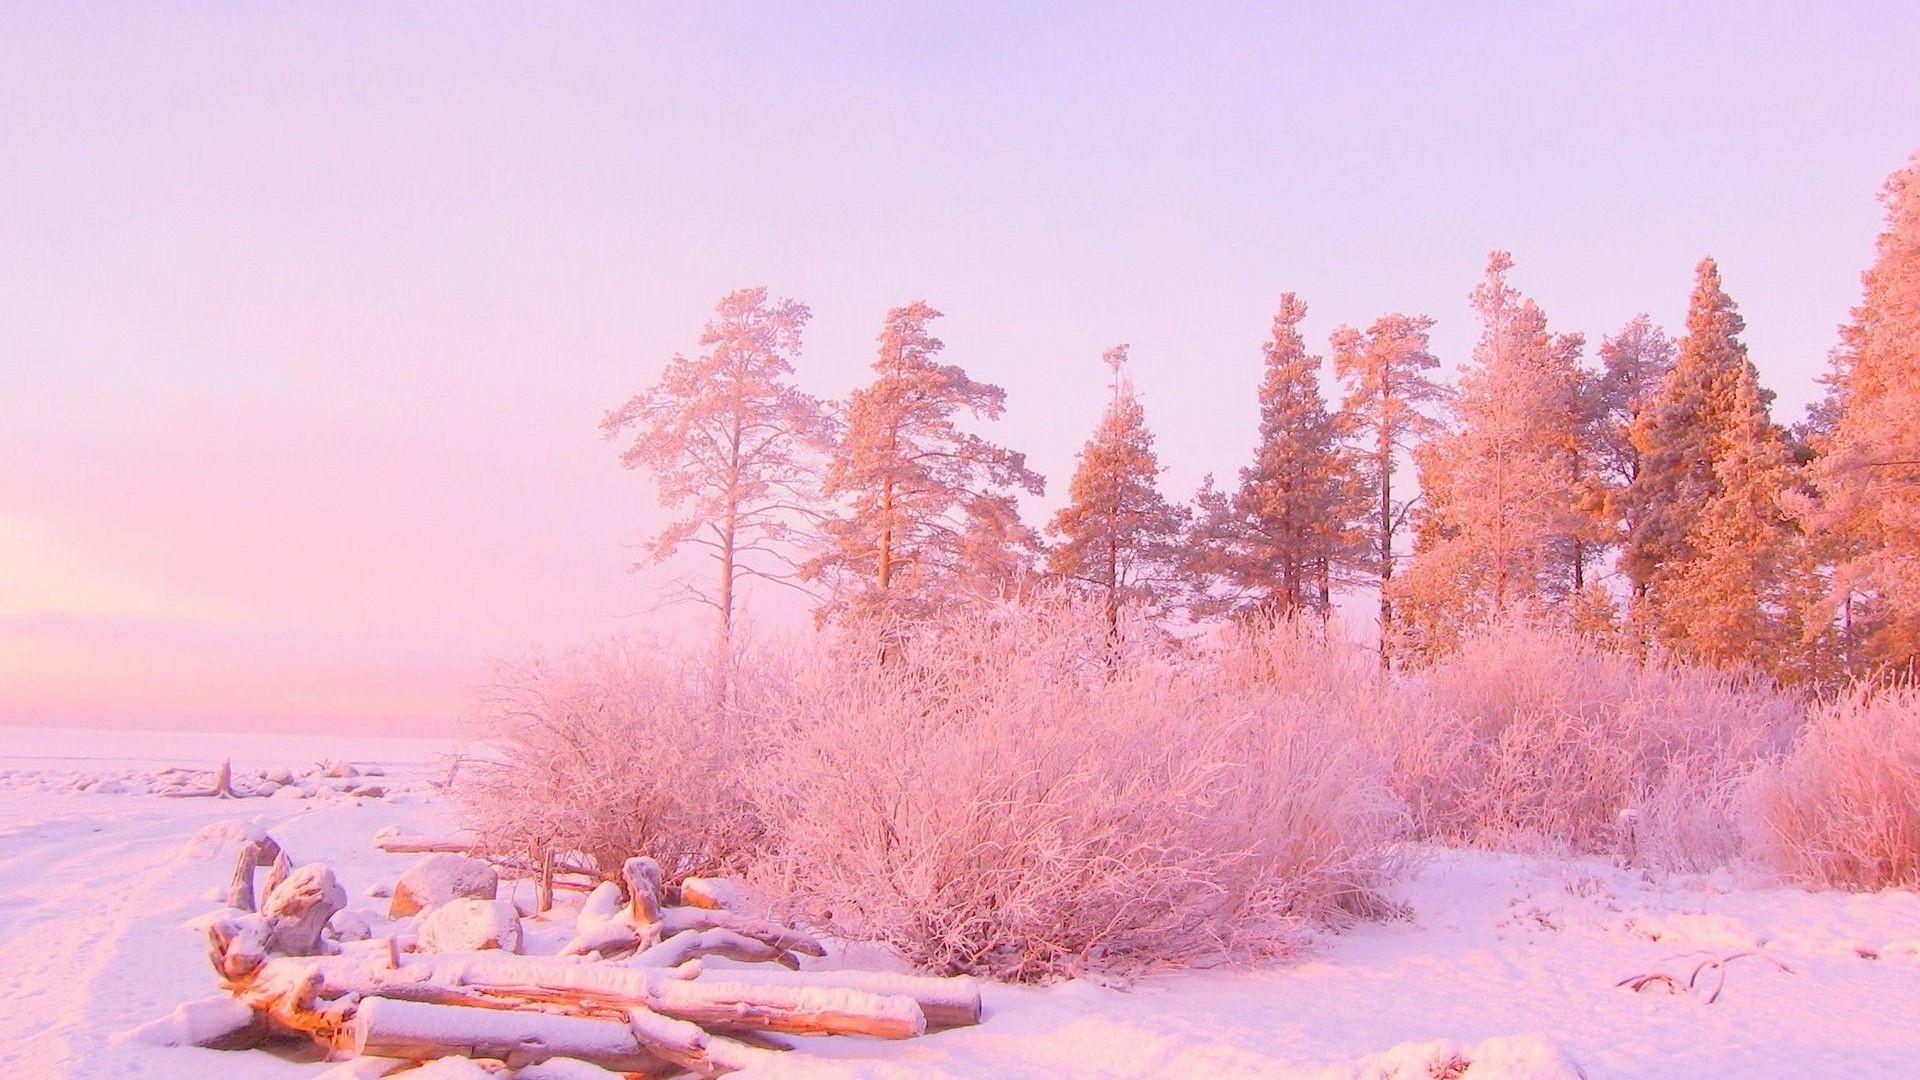 775073 widescreen pink backgrounds for desktop 1920x1080 for meizu